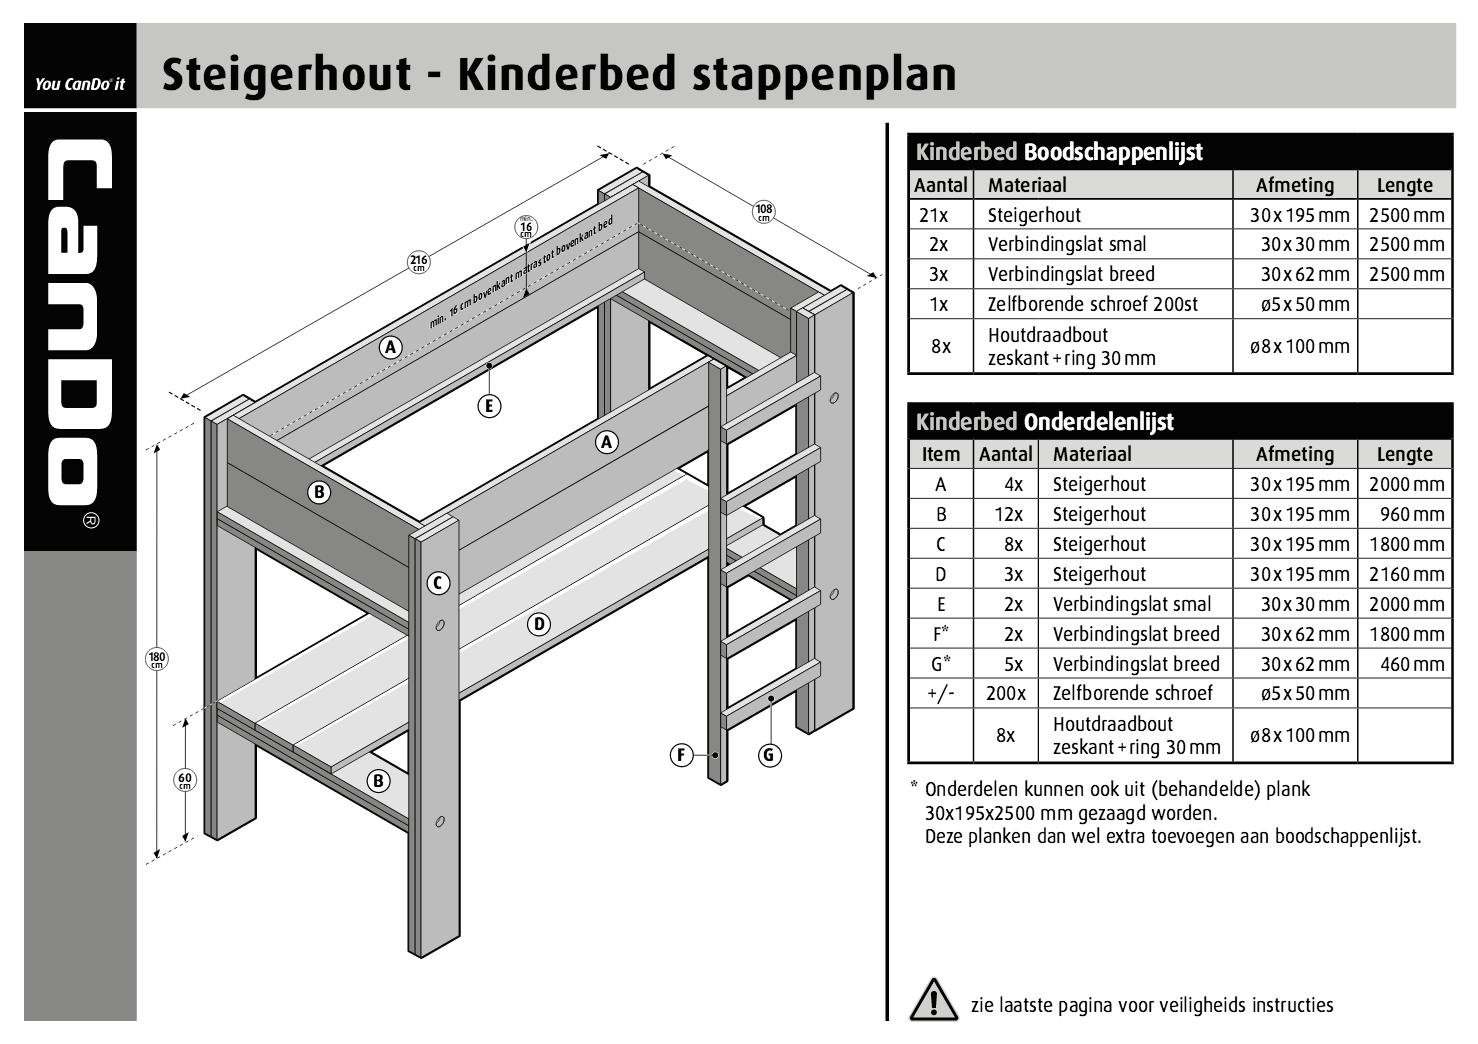 Steigerhout Bureau Tekening.Kinderbed Met Bureau Met Bouwtekening Voordemakers Nl